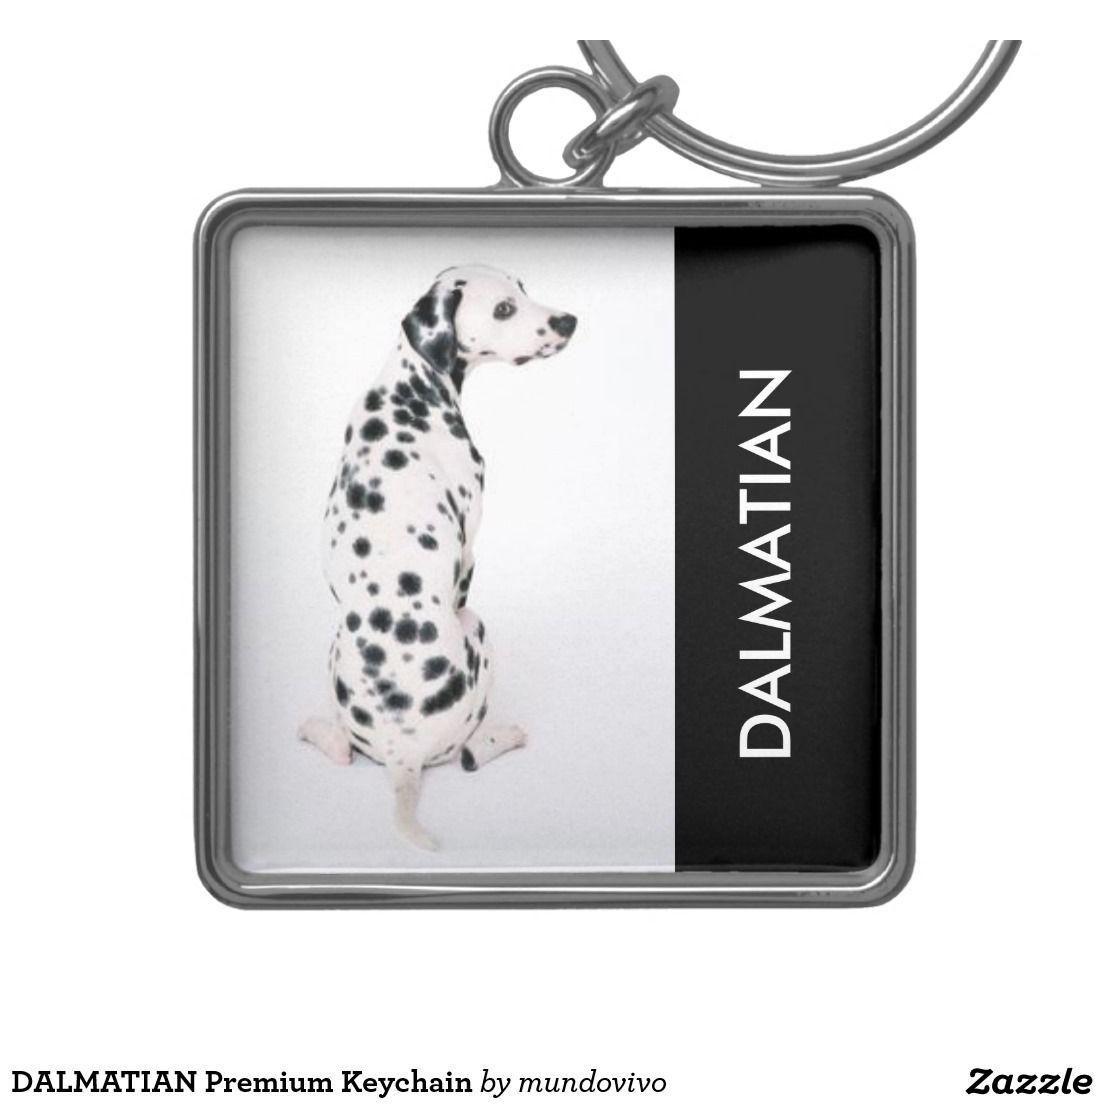 DALMATIAN Premium Keychain | Keychain, Dalmatian, Fobs